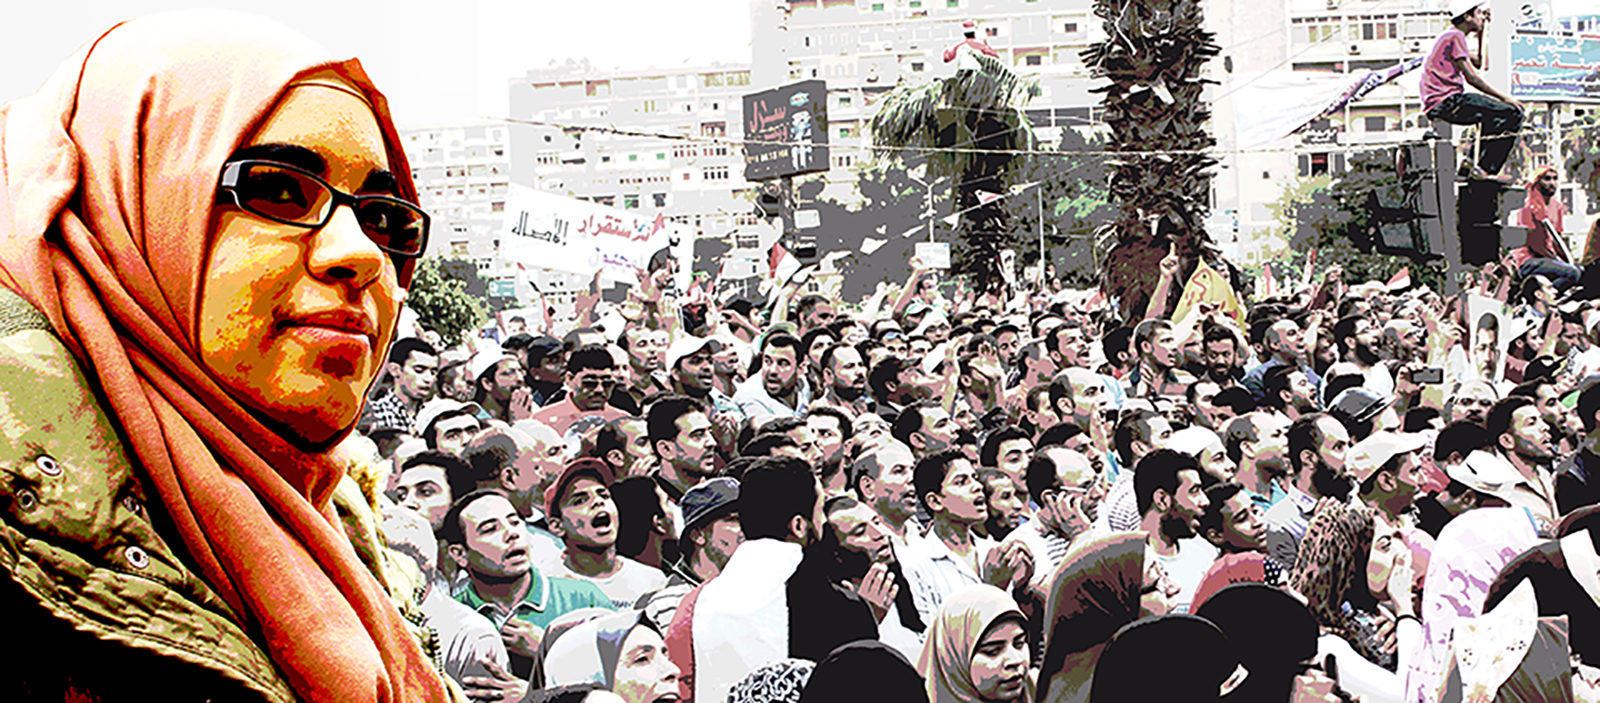 Egypt Small3